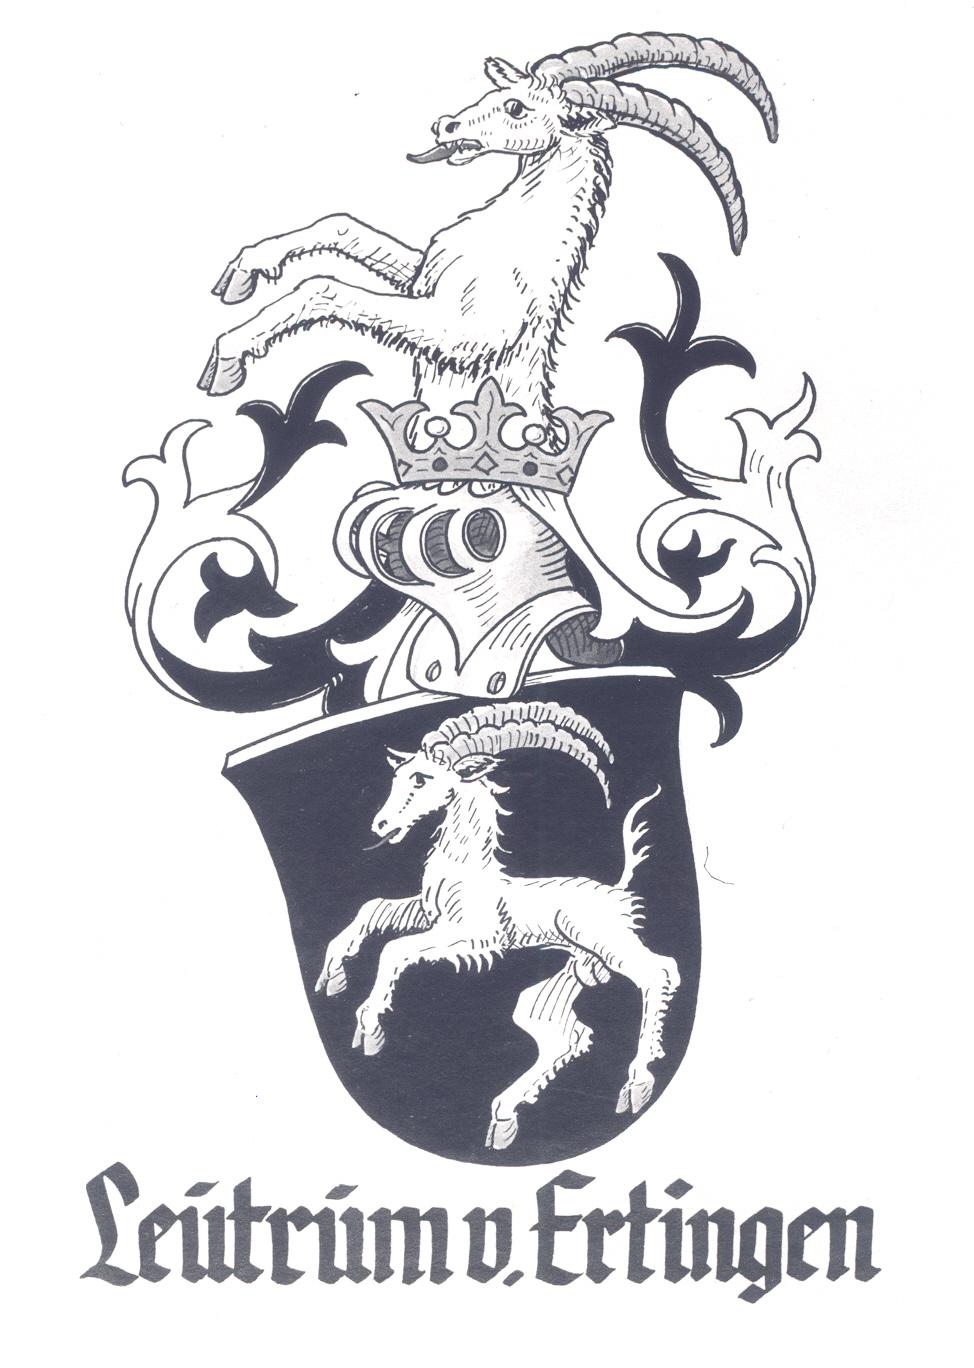 Leutrumsches Wappen